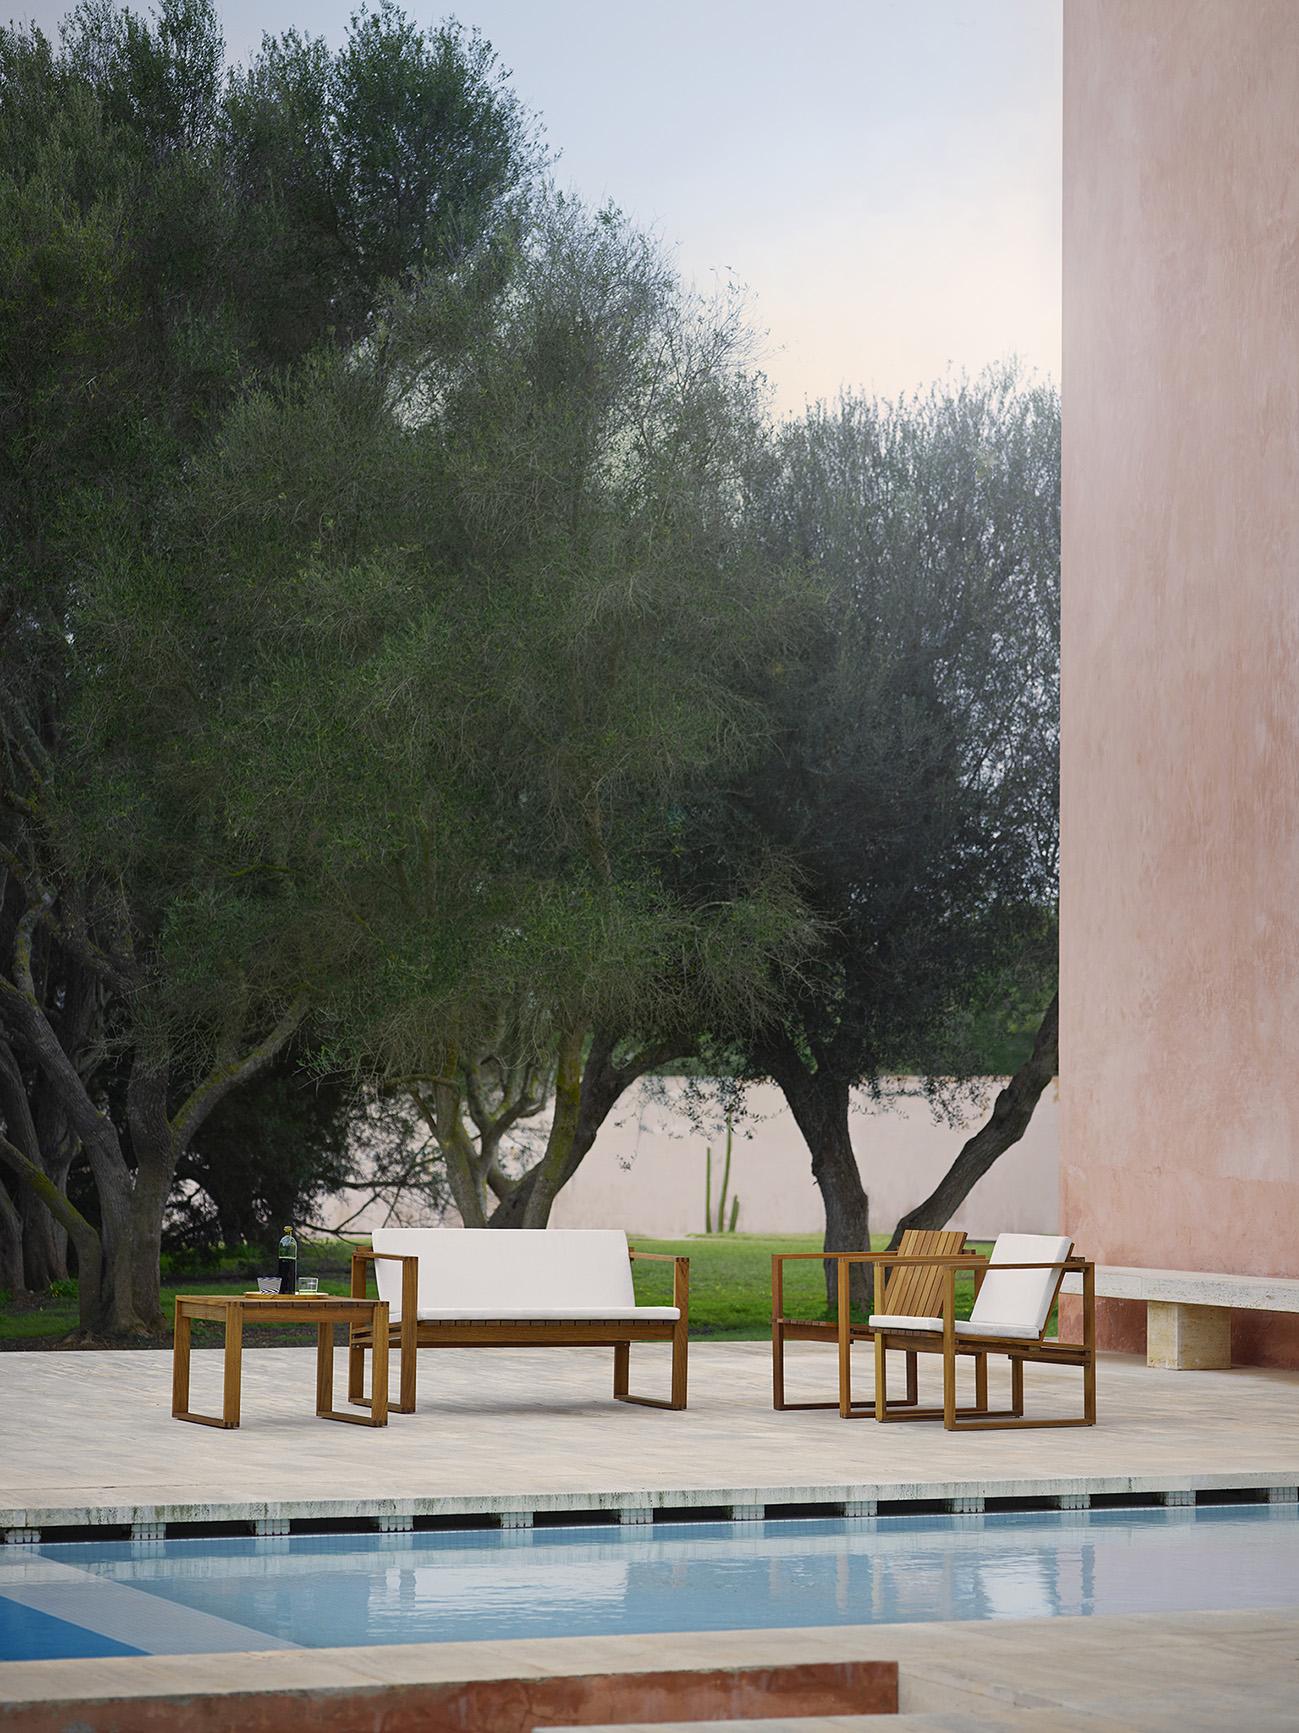 Kjaer_BK16-Side-Table_BK12-Lounge-Seating-2_BK11-Lounge-Chair_Teak.jpg